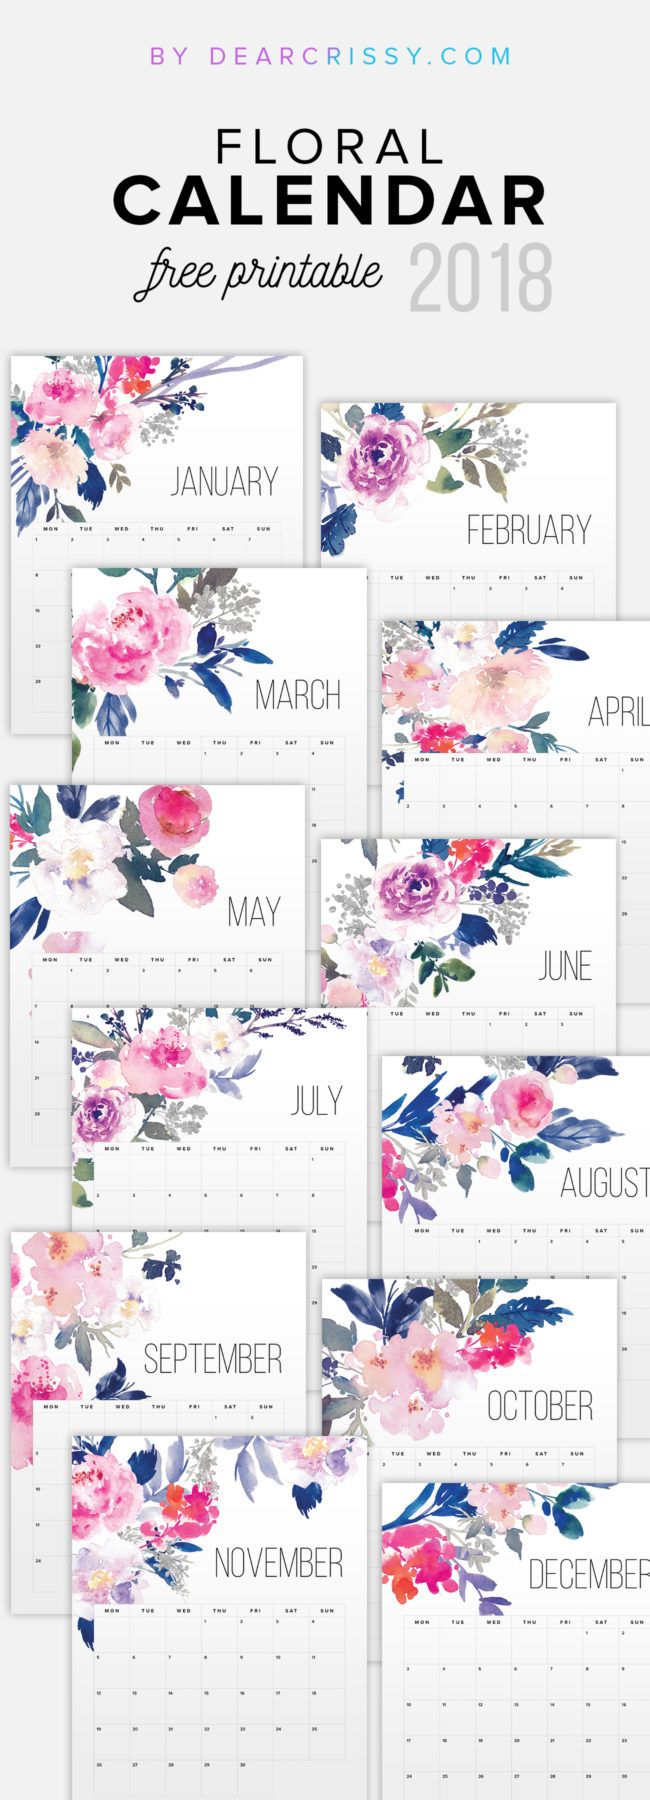 Free Printable Floral Calendar 2018 - This pretty…Edit description